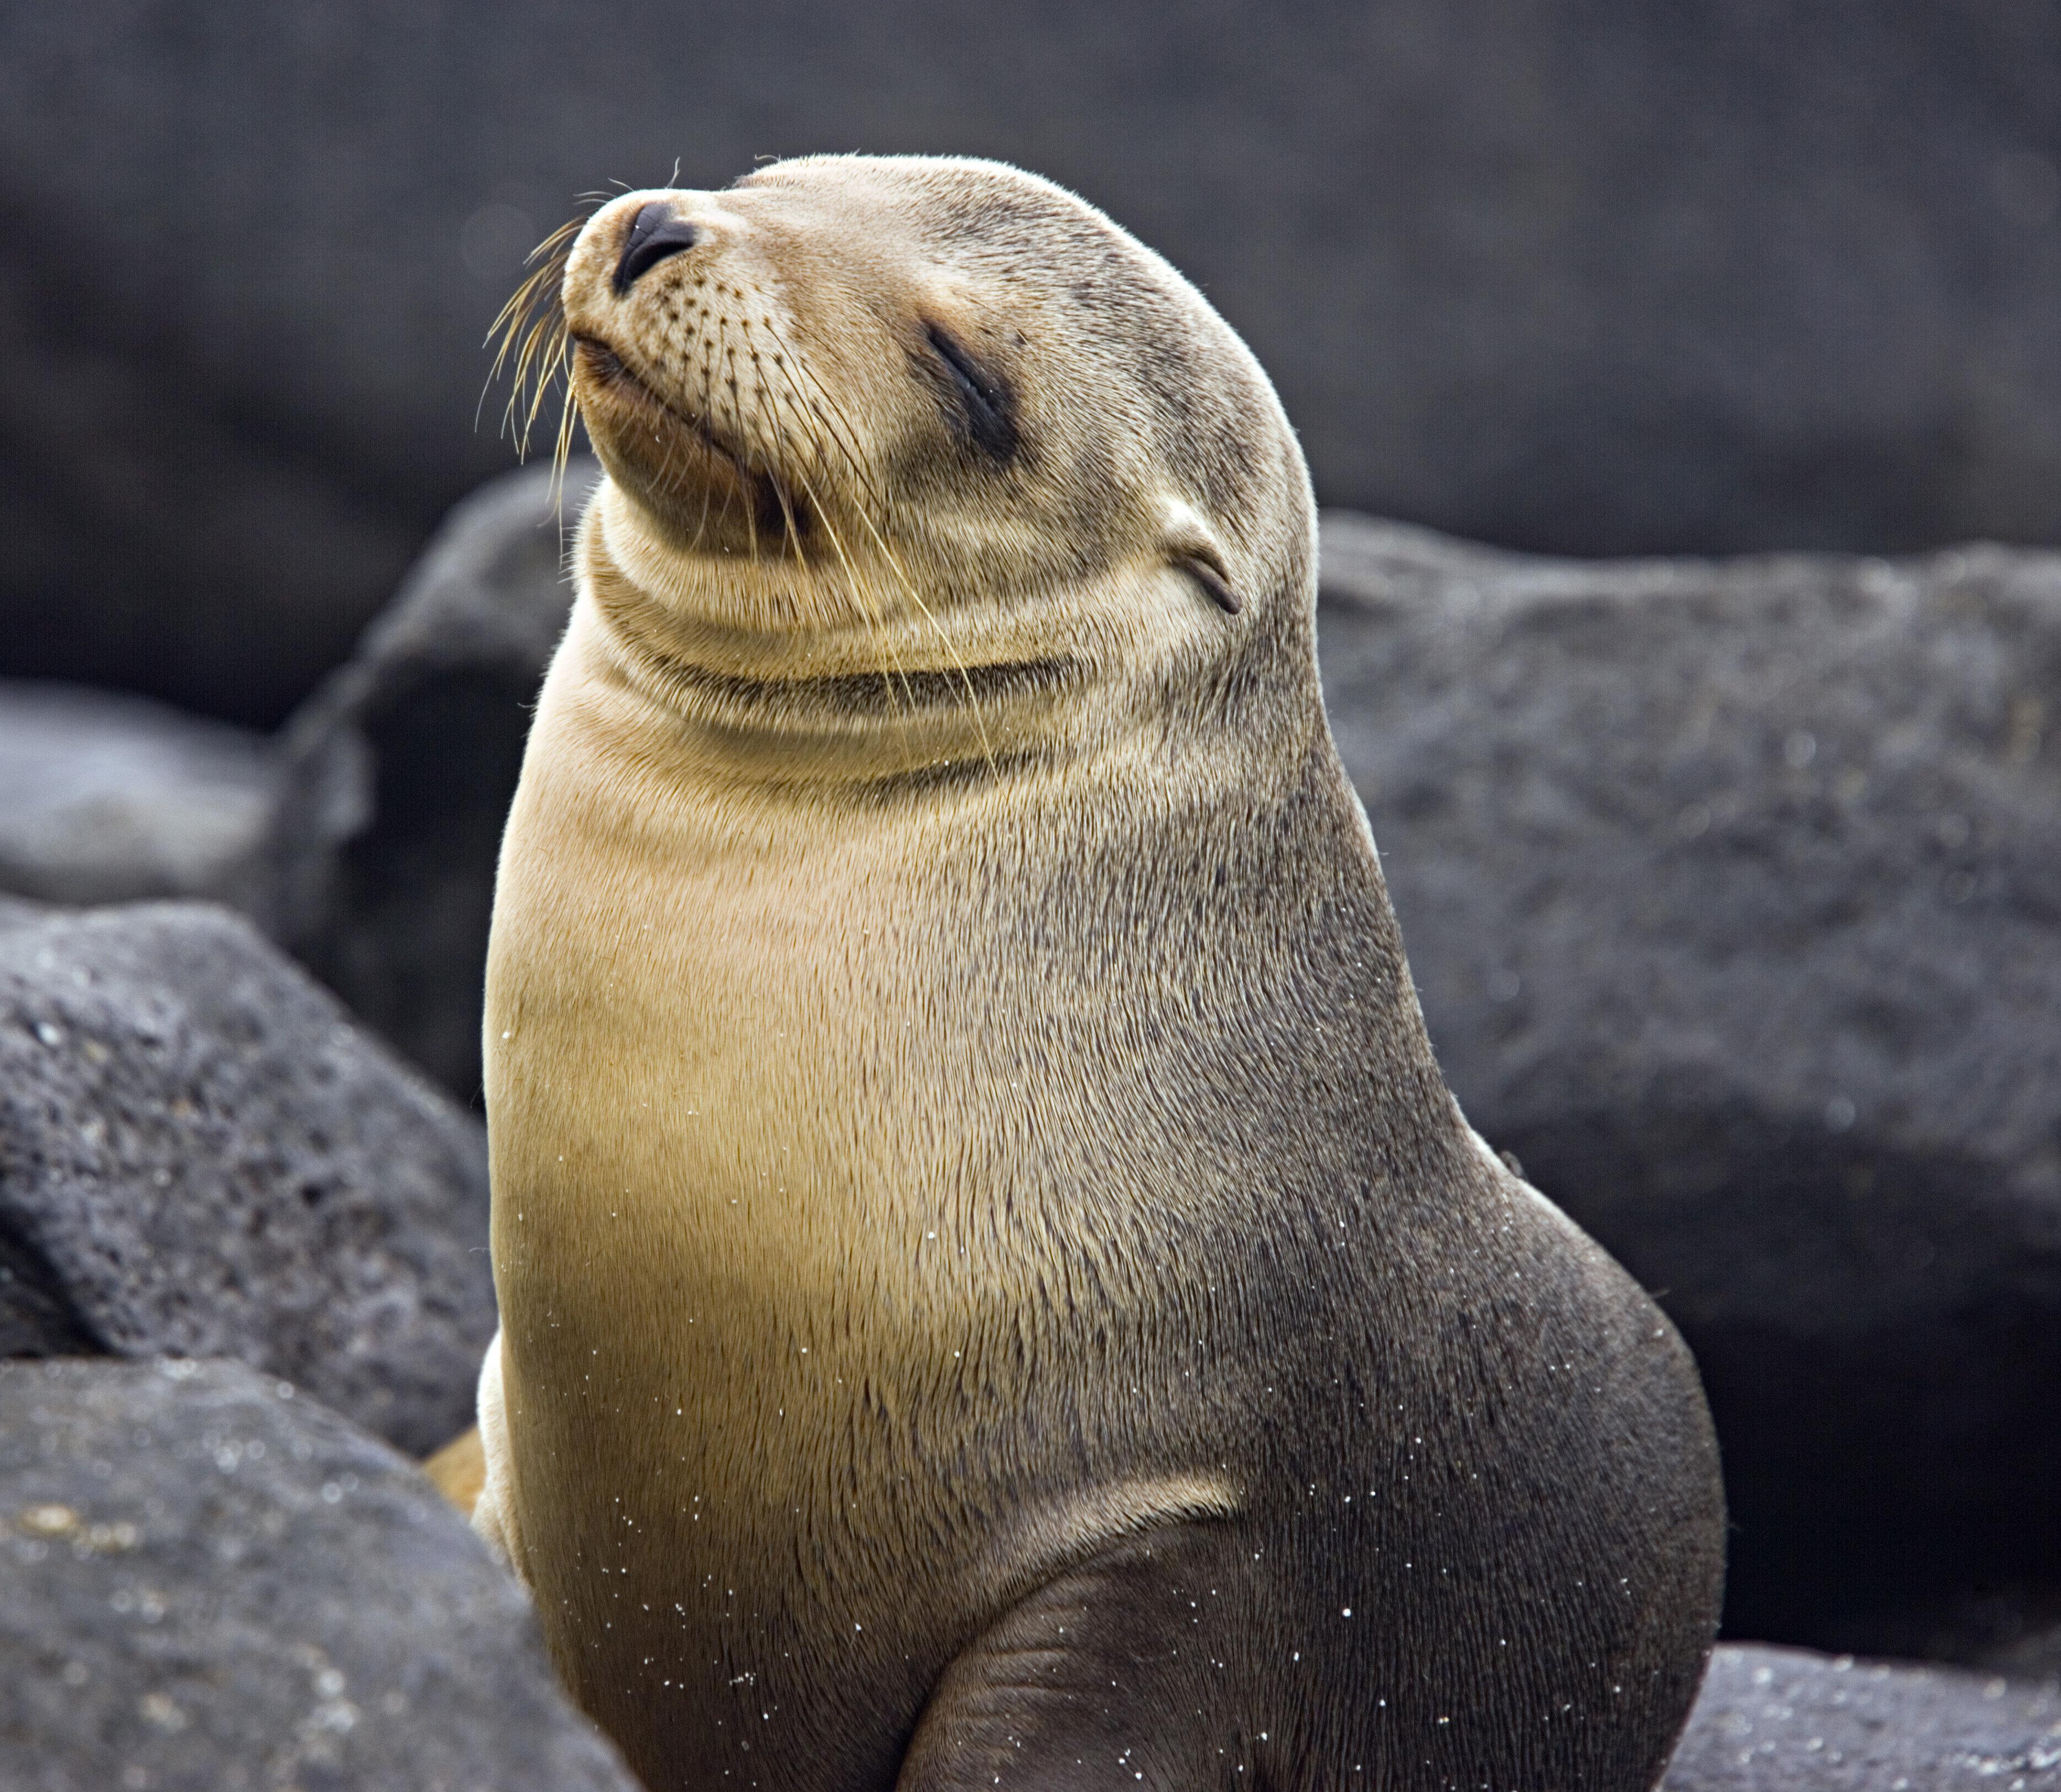 Young Galapagos Sea Lion, Zalophus californianus wollebaeki. Galapagos